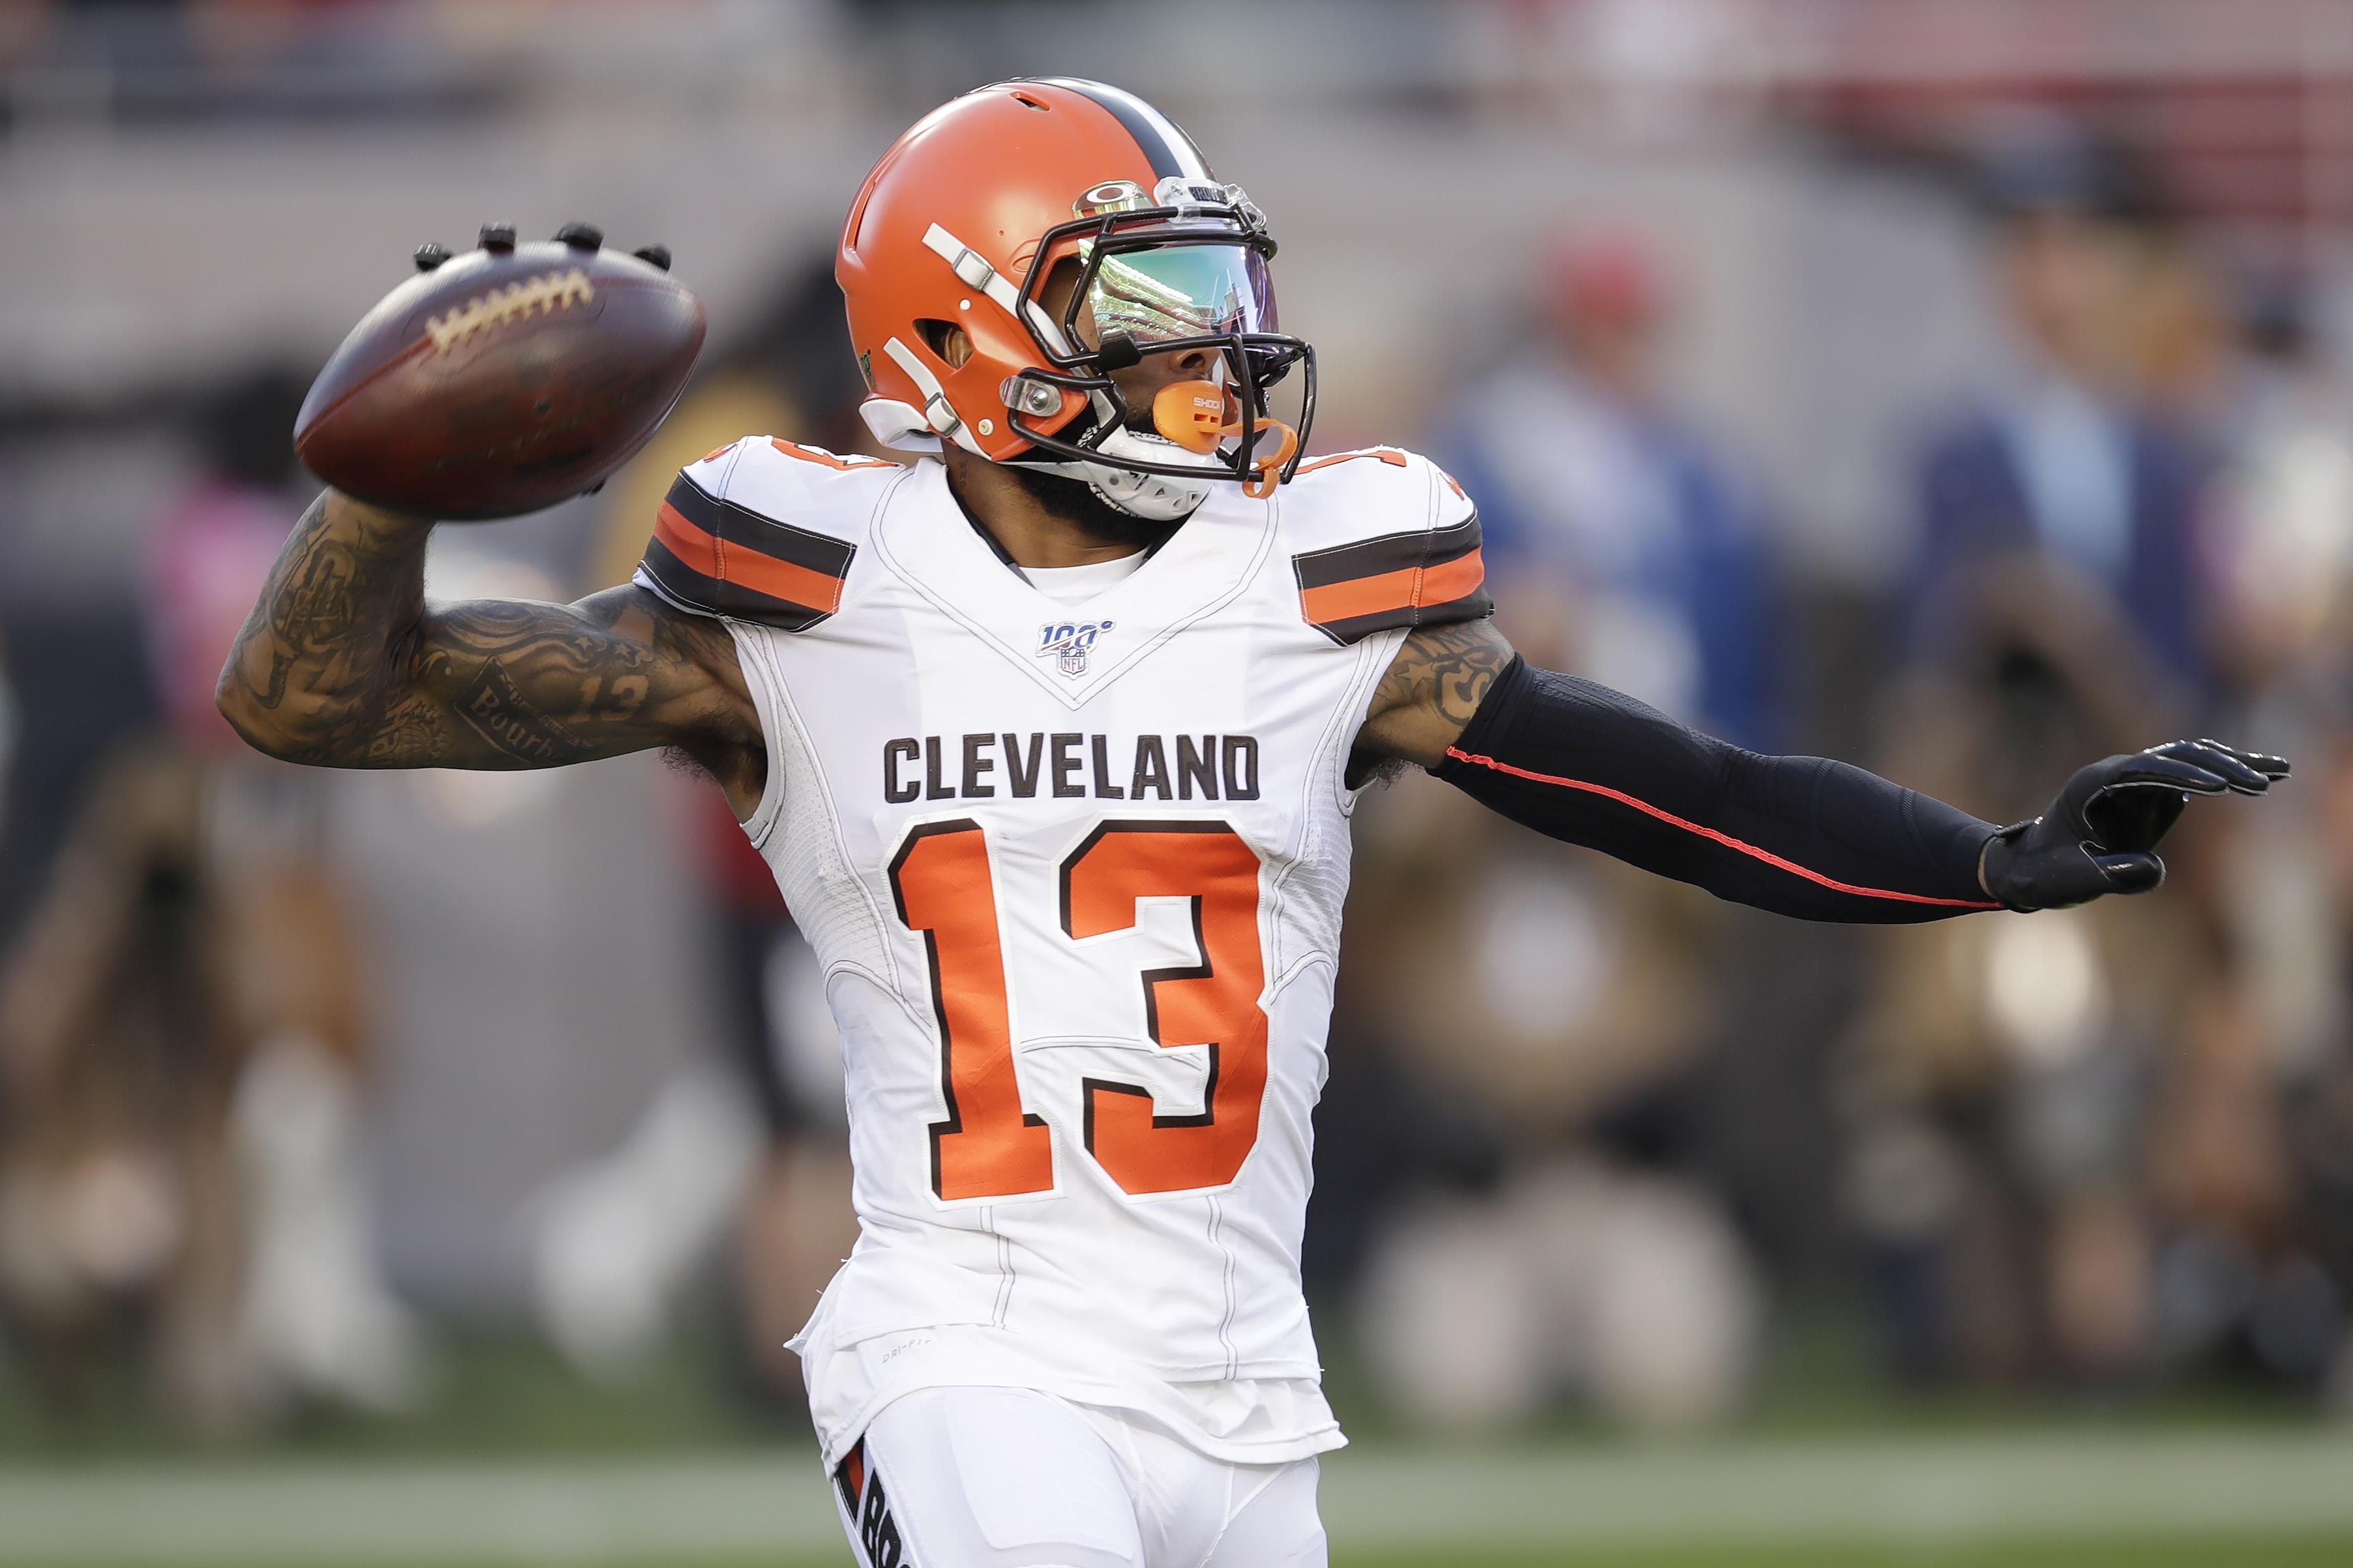 NFL rumors: Is Browns' Odell Beckham the next Deion Sanders or Bo Jackson? Does OBJ know Prime Time?